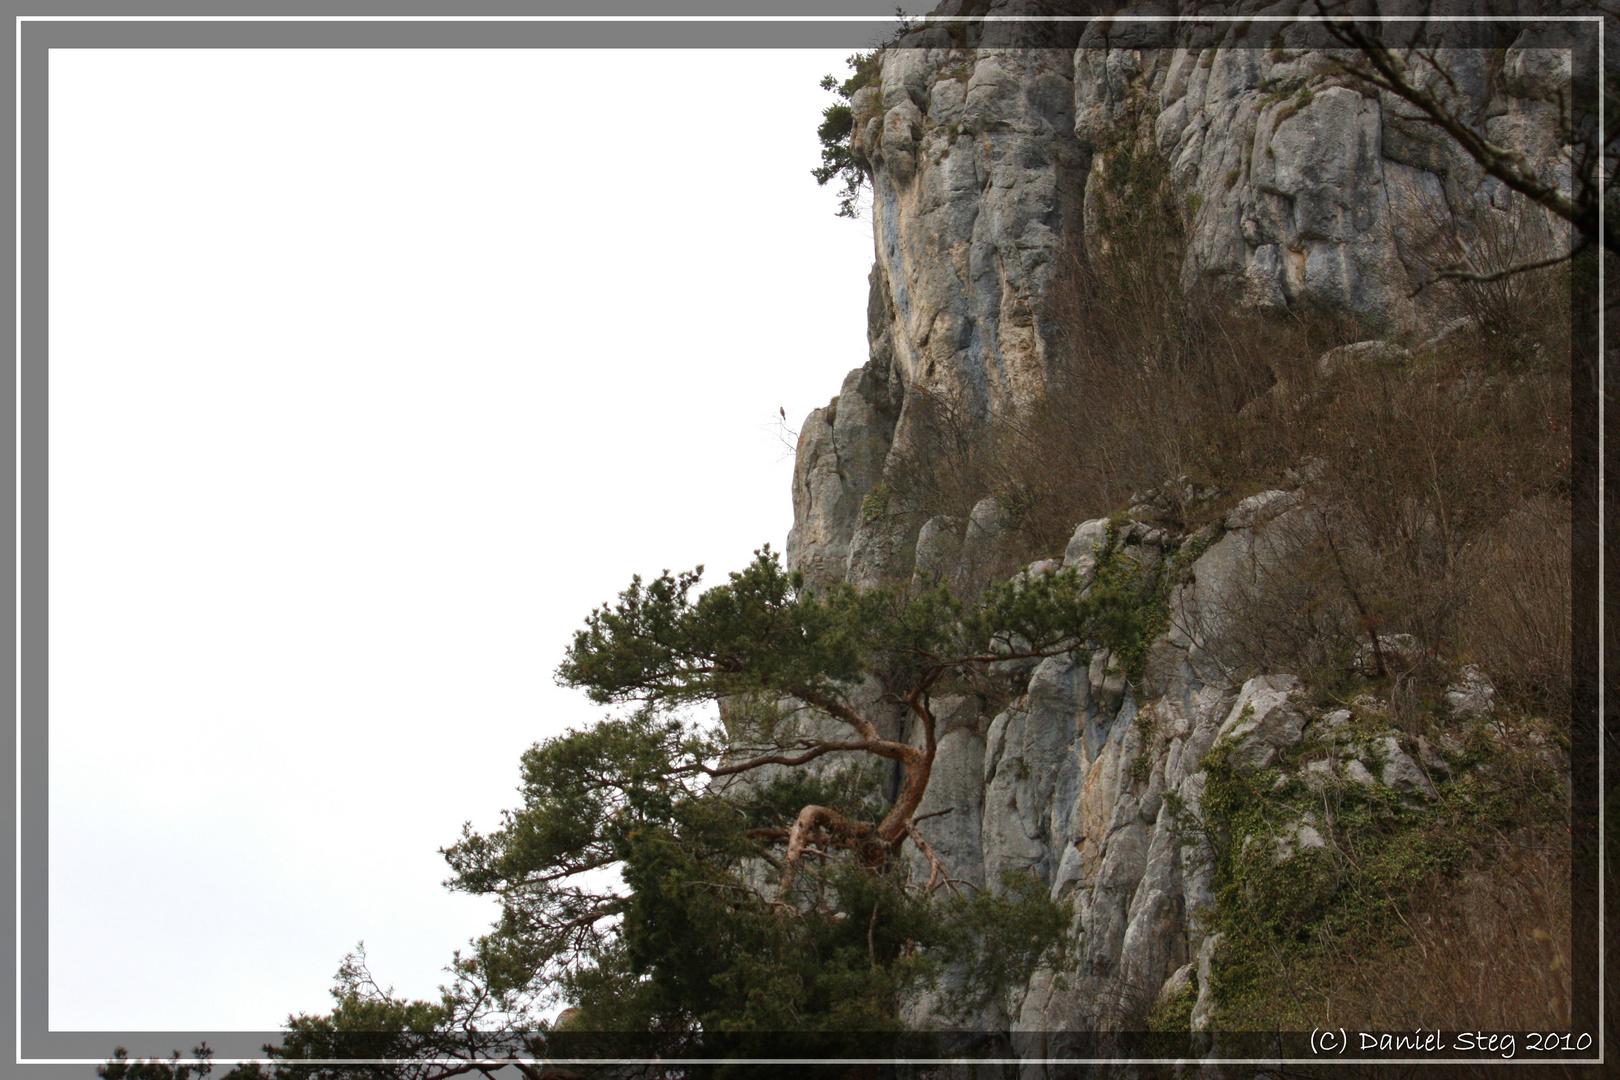 Habitat der Vipera aspis aspis im Jura